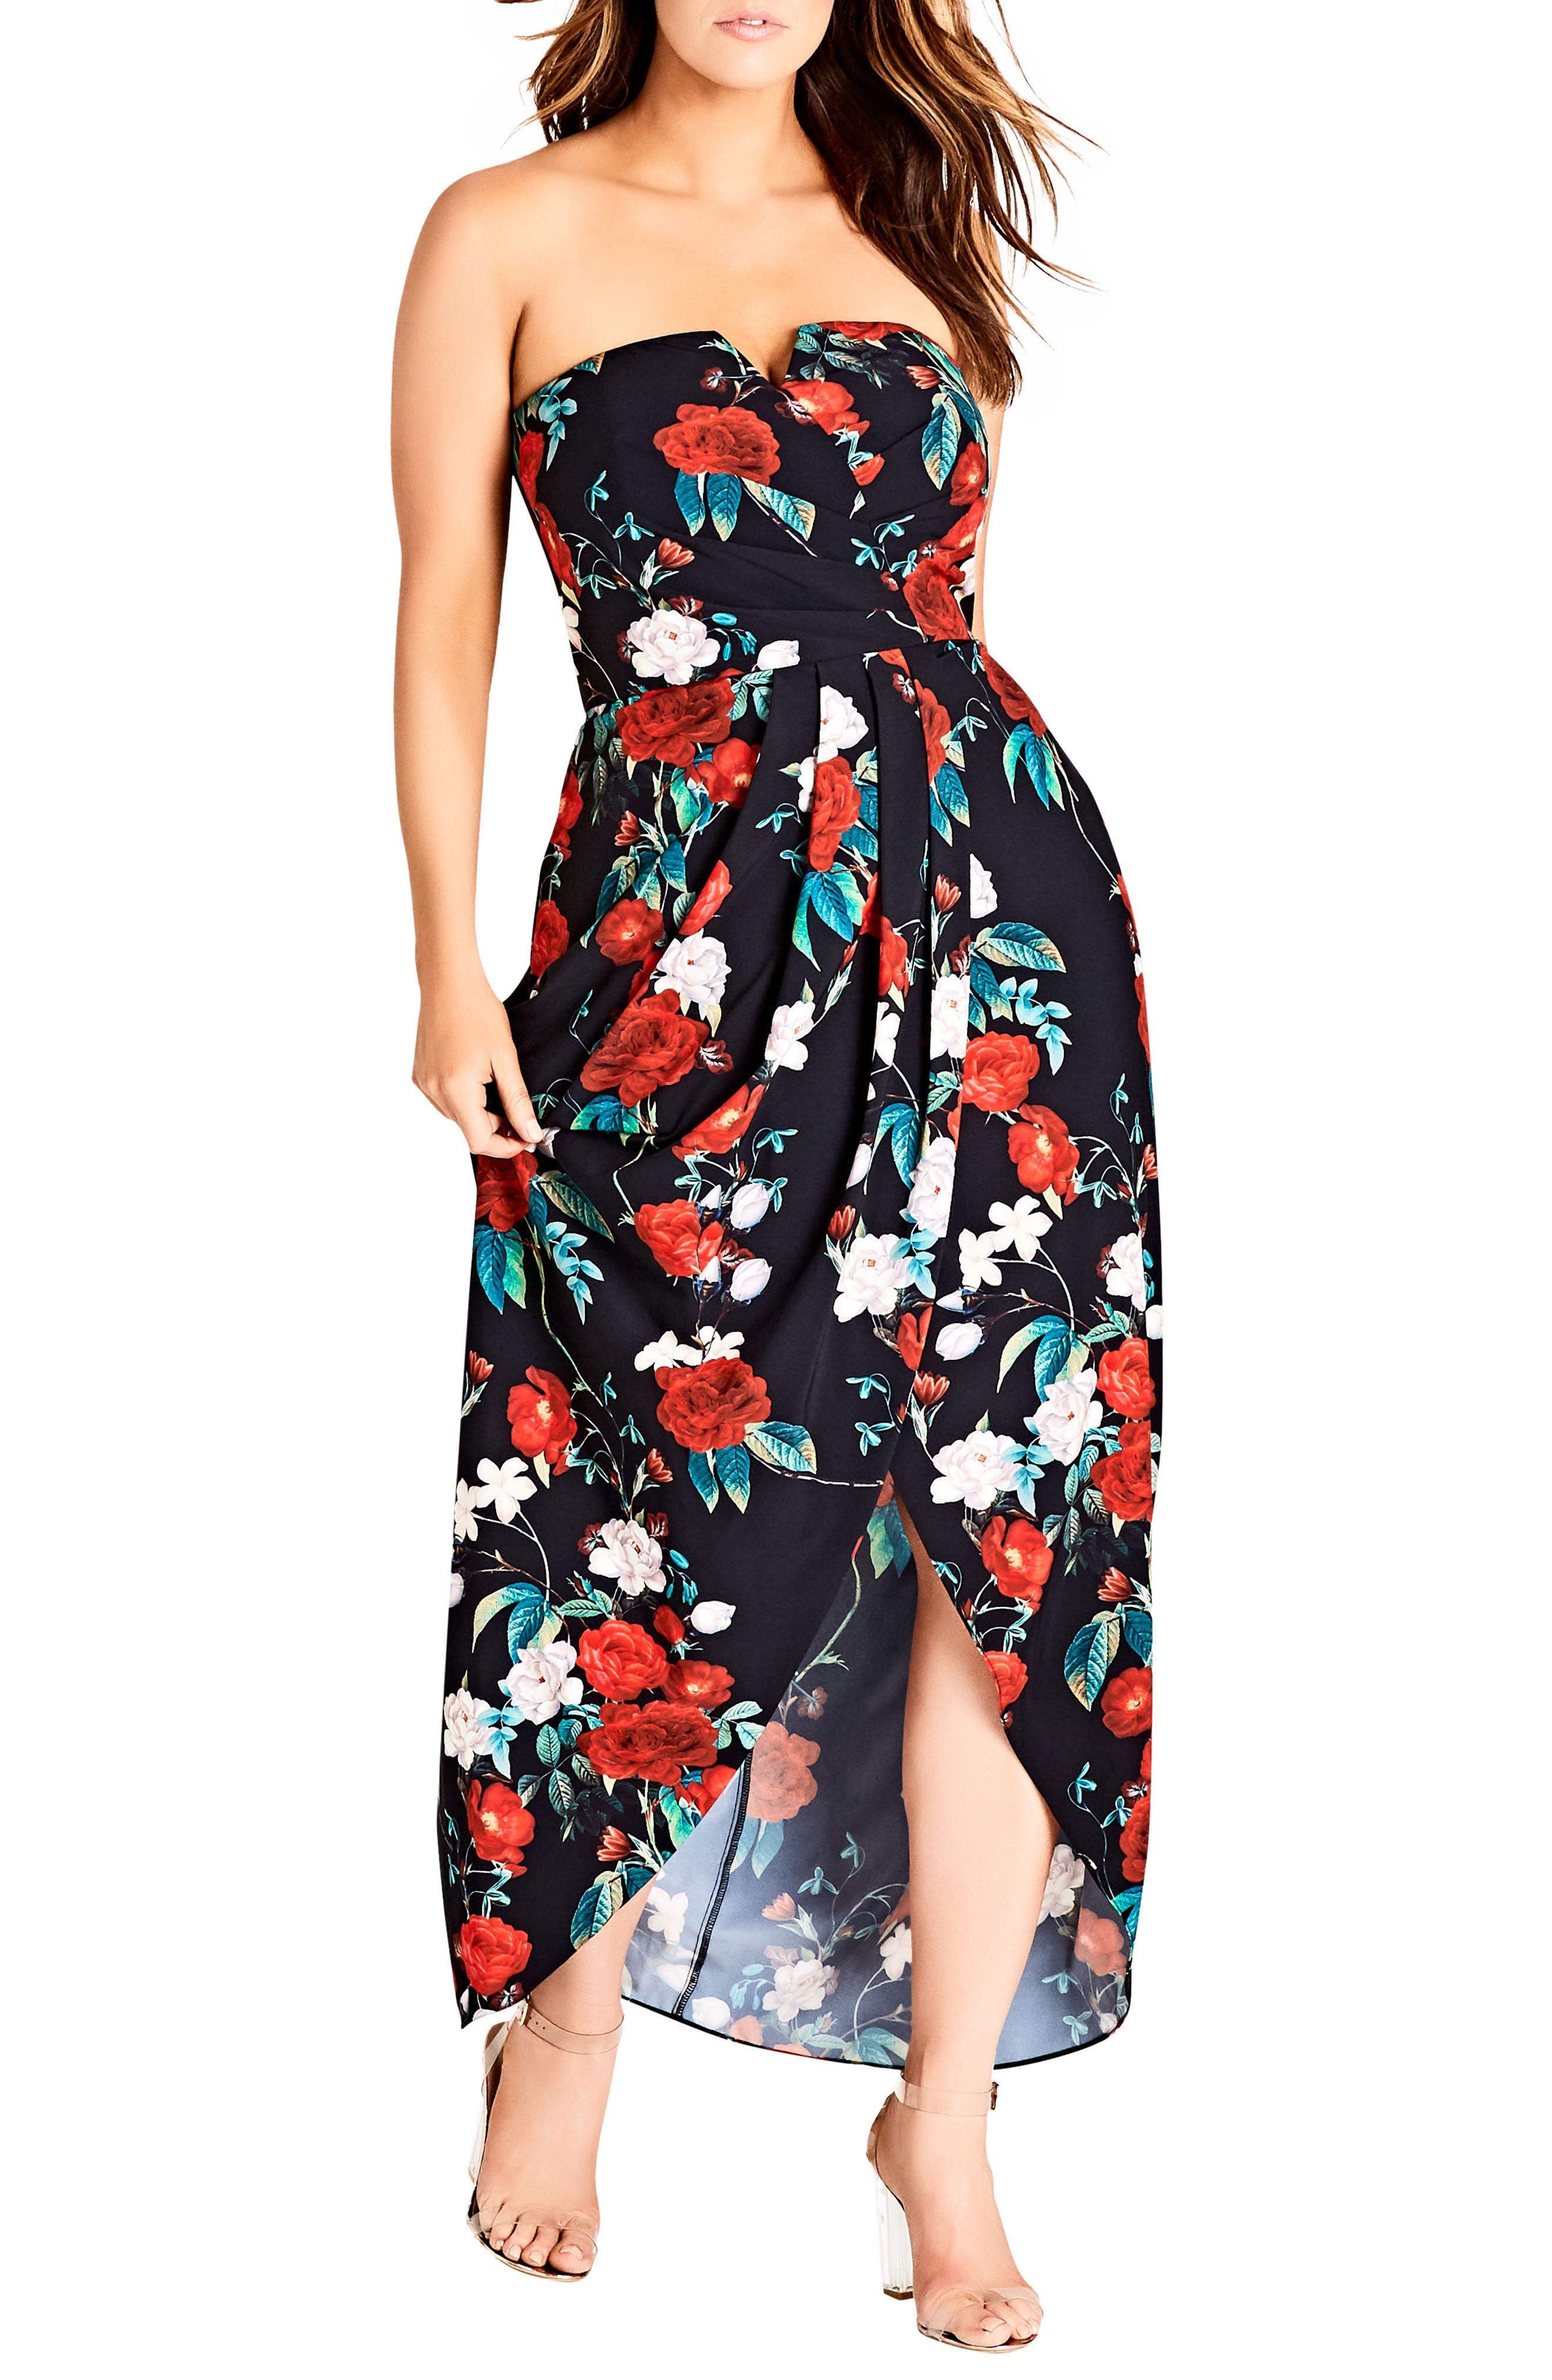 Come Hither Maxi Dress,                             Main thumbnail 1, color,                             001